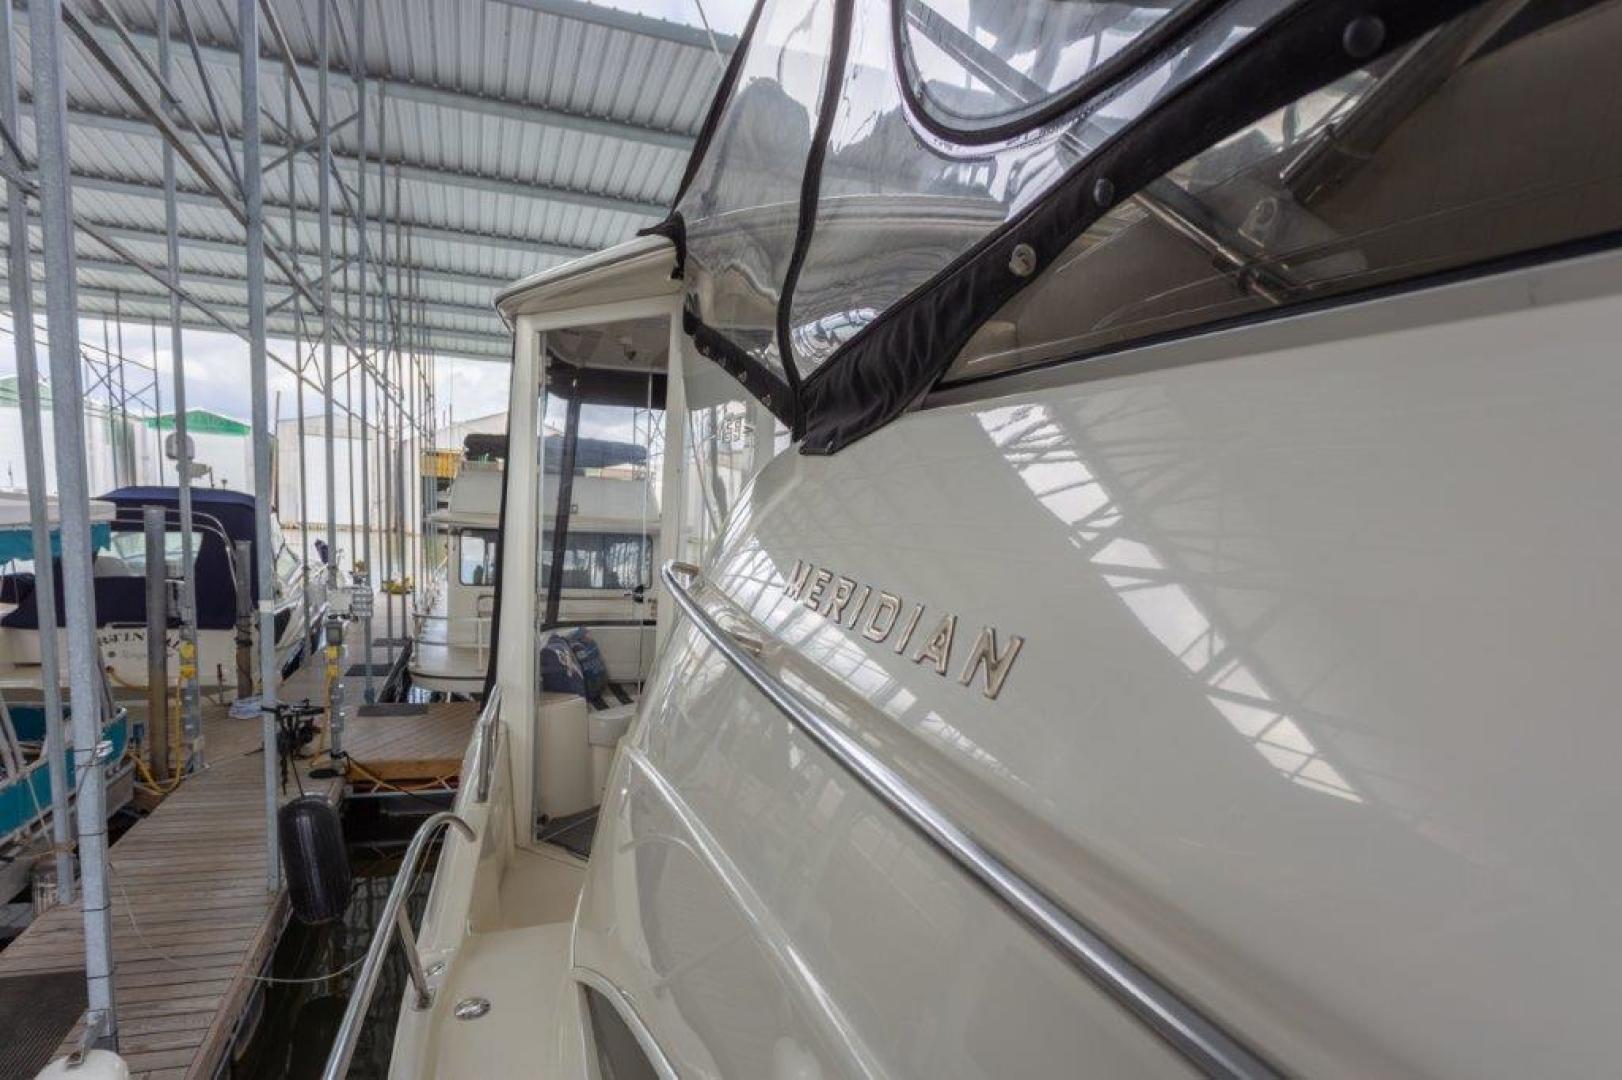 Meridian-459 Motoryacht 2004-Total Pleasure Chattanooga-Tennessee-United States-553077 | Thumbnail